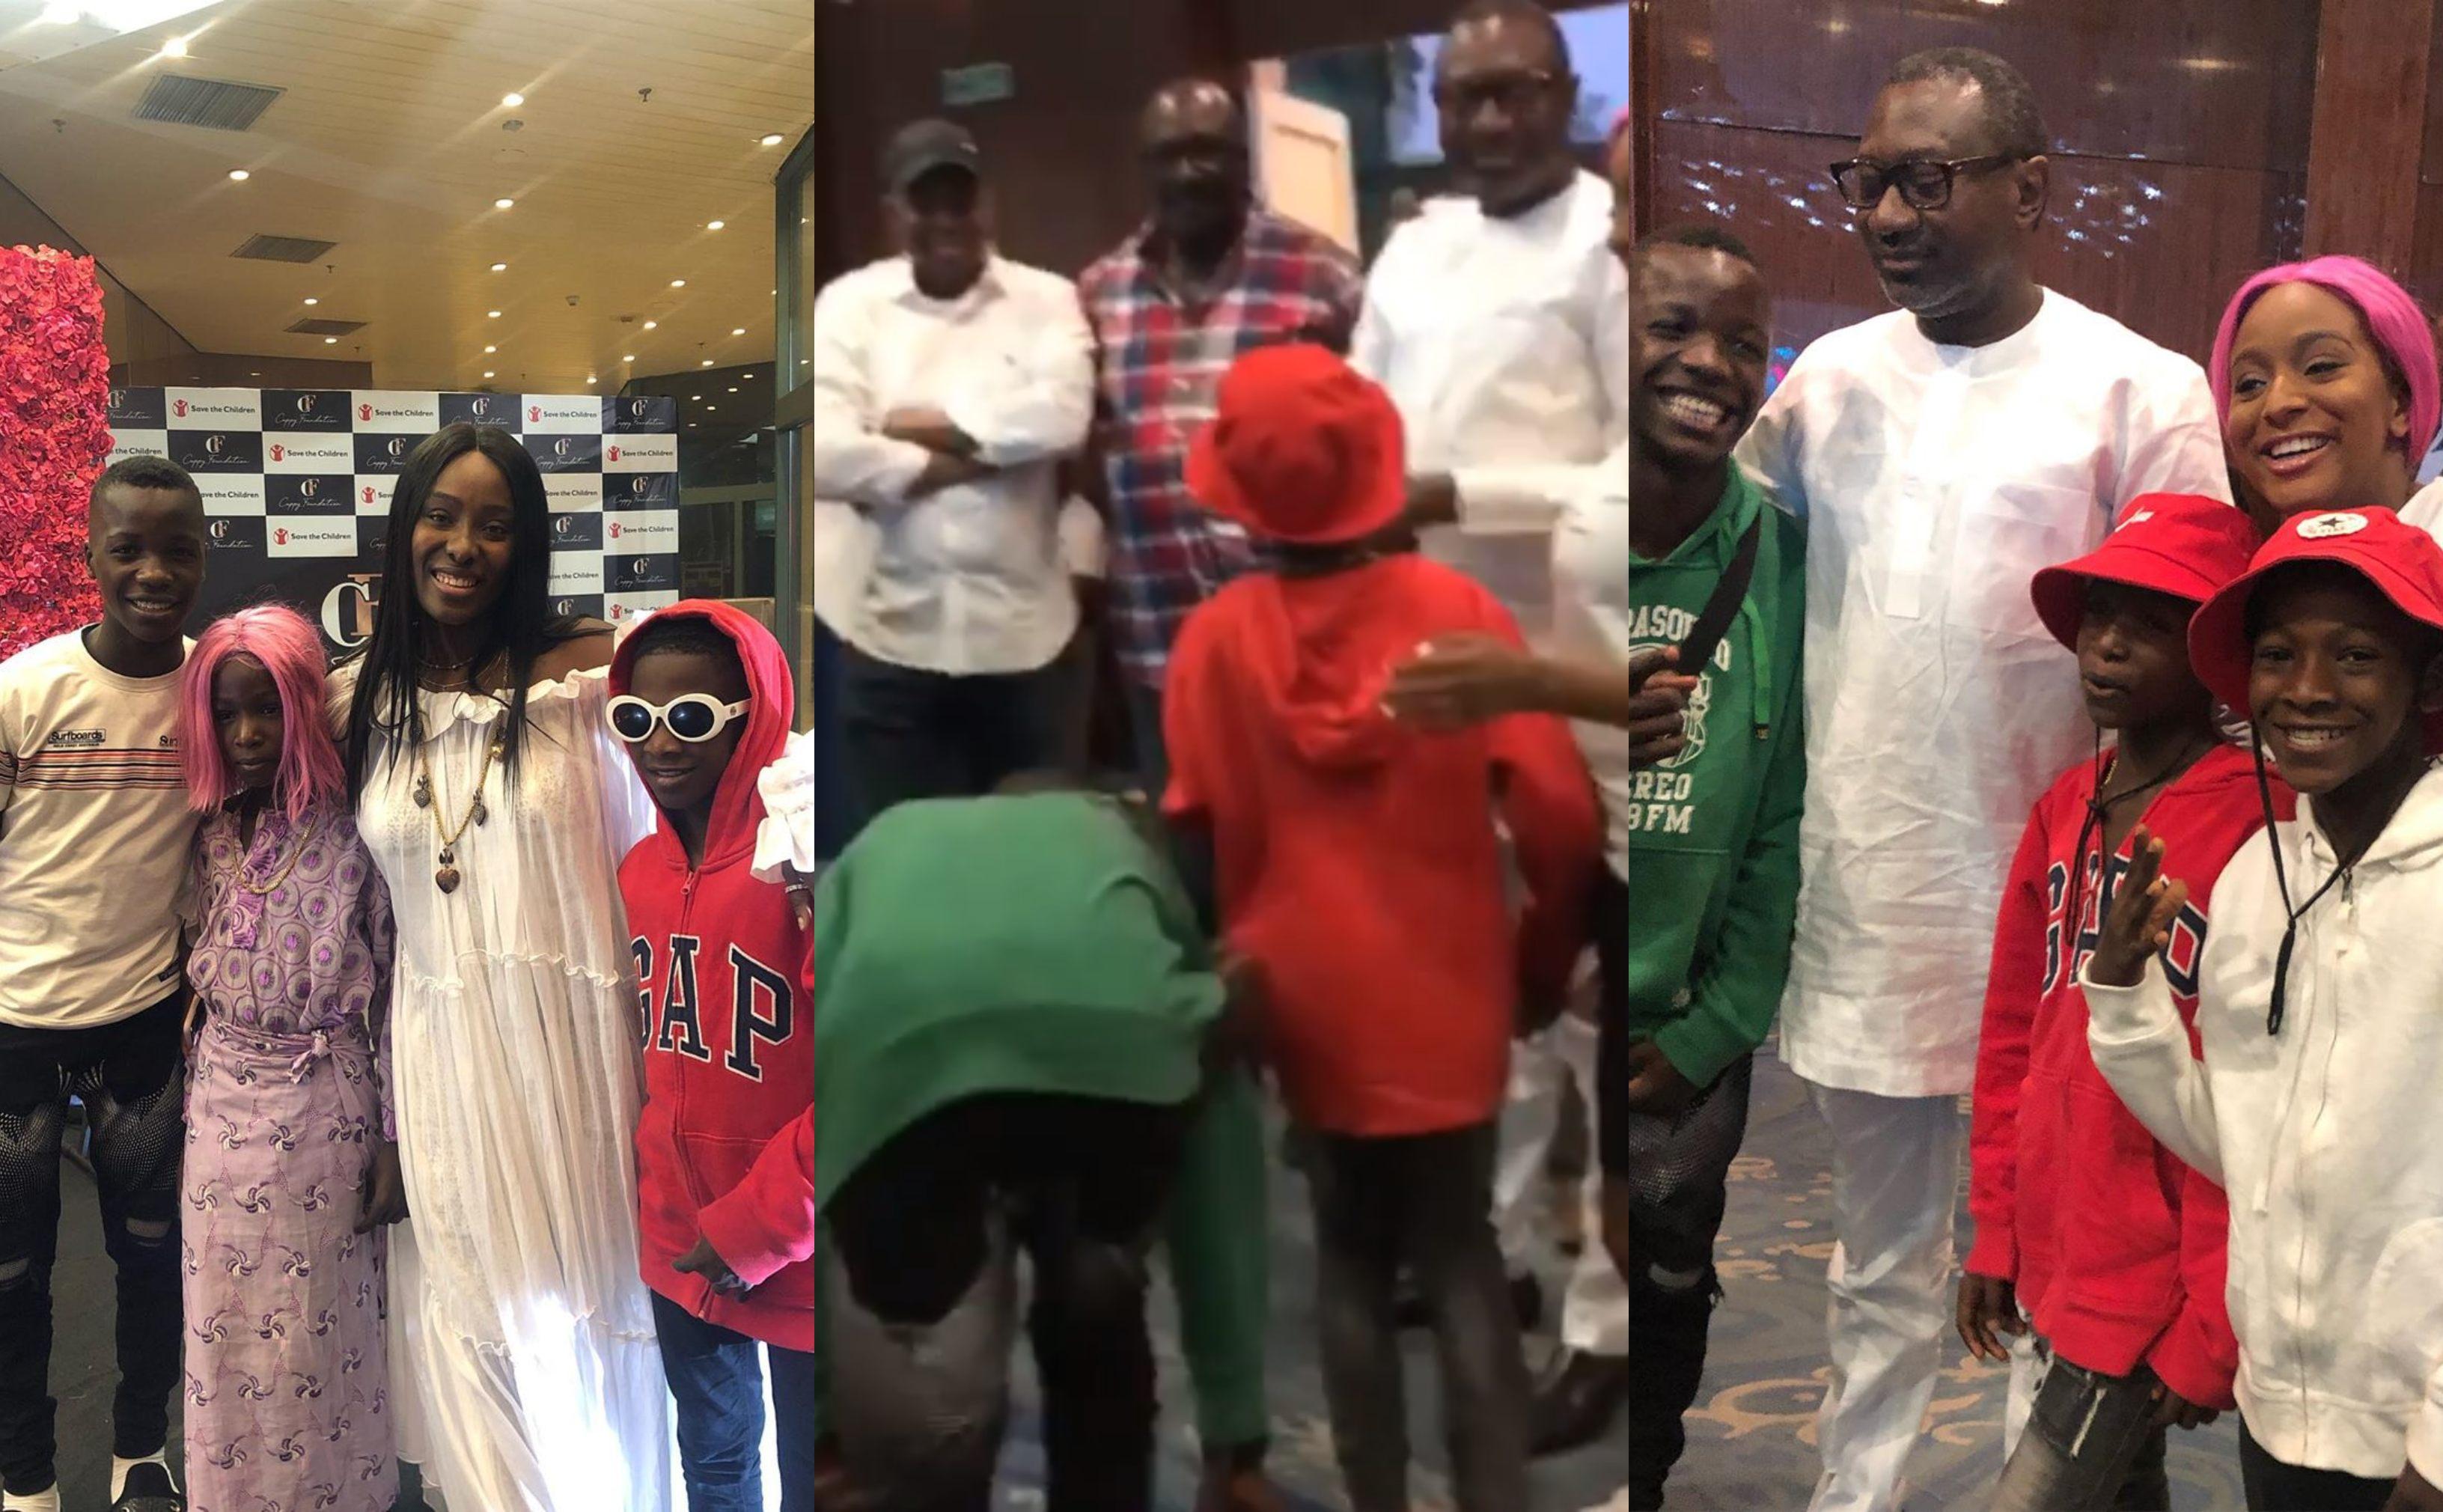 Ikorodu Bois prostrate for Billionaire Femi Otedola at DJ Cuppy's 27th birthday (Photos & Video)